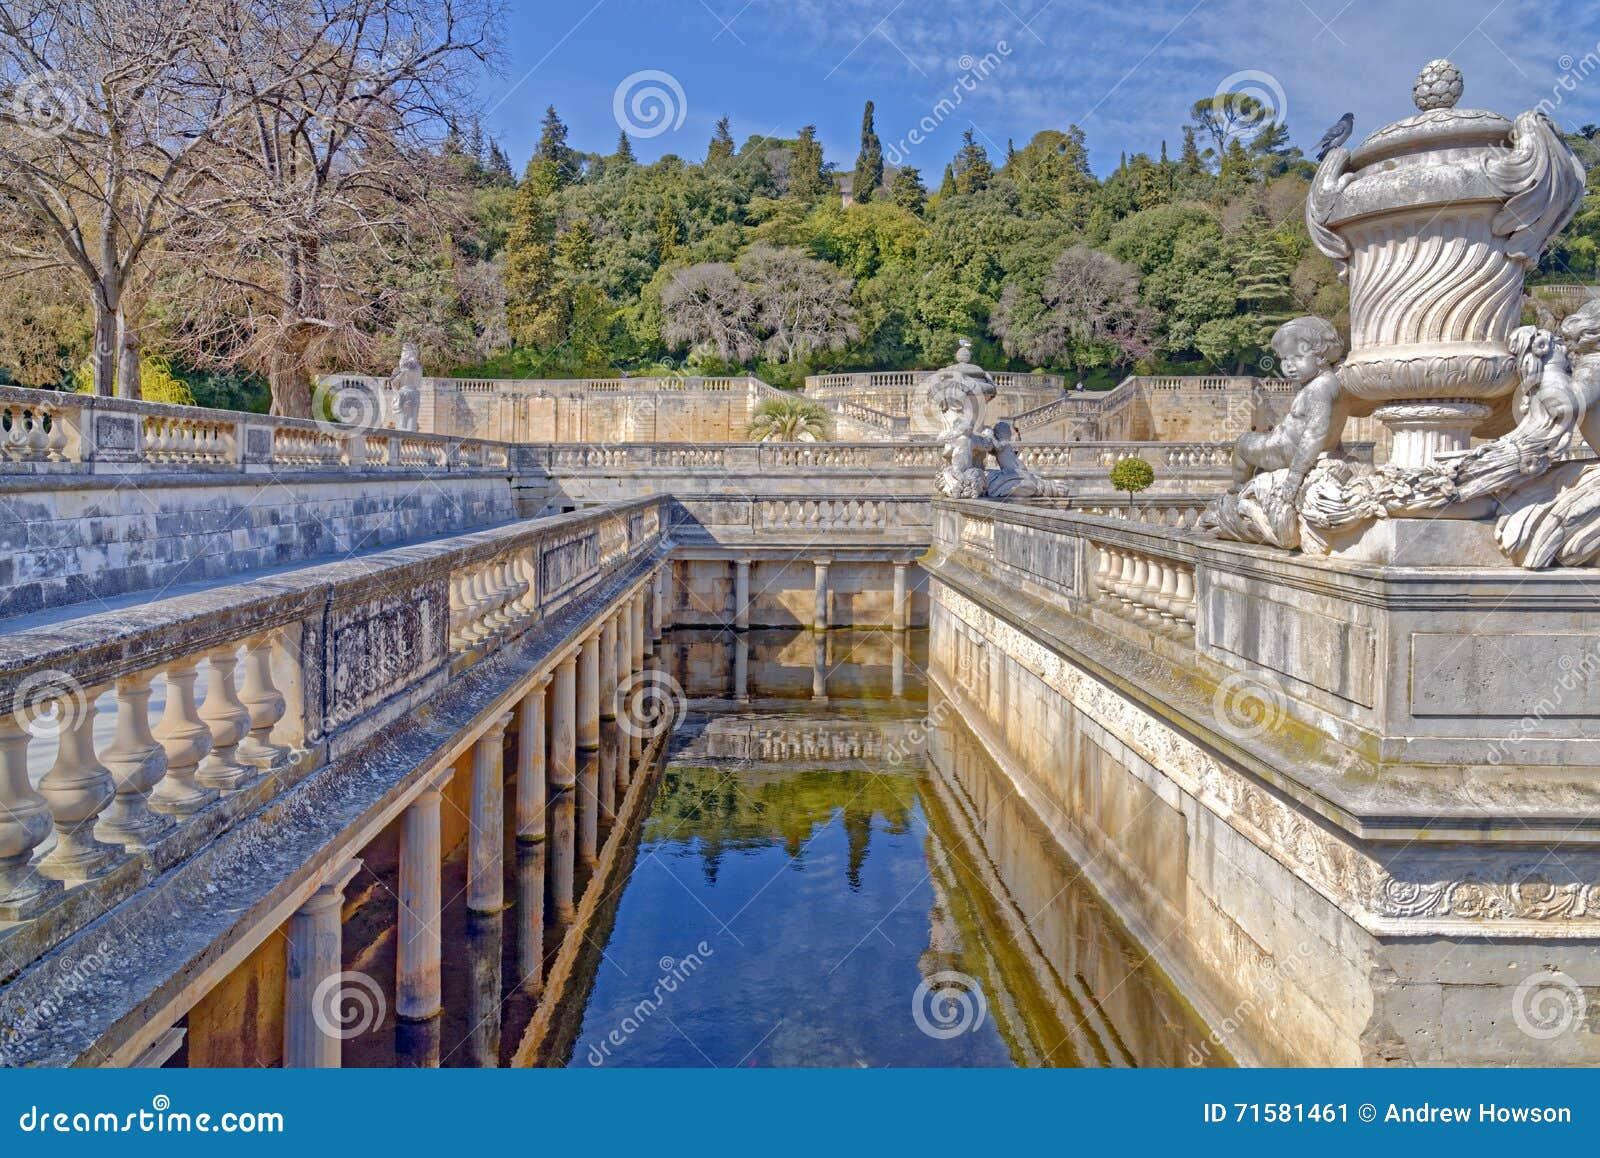 Nimes, The Fountain Gardens Stock Photo